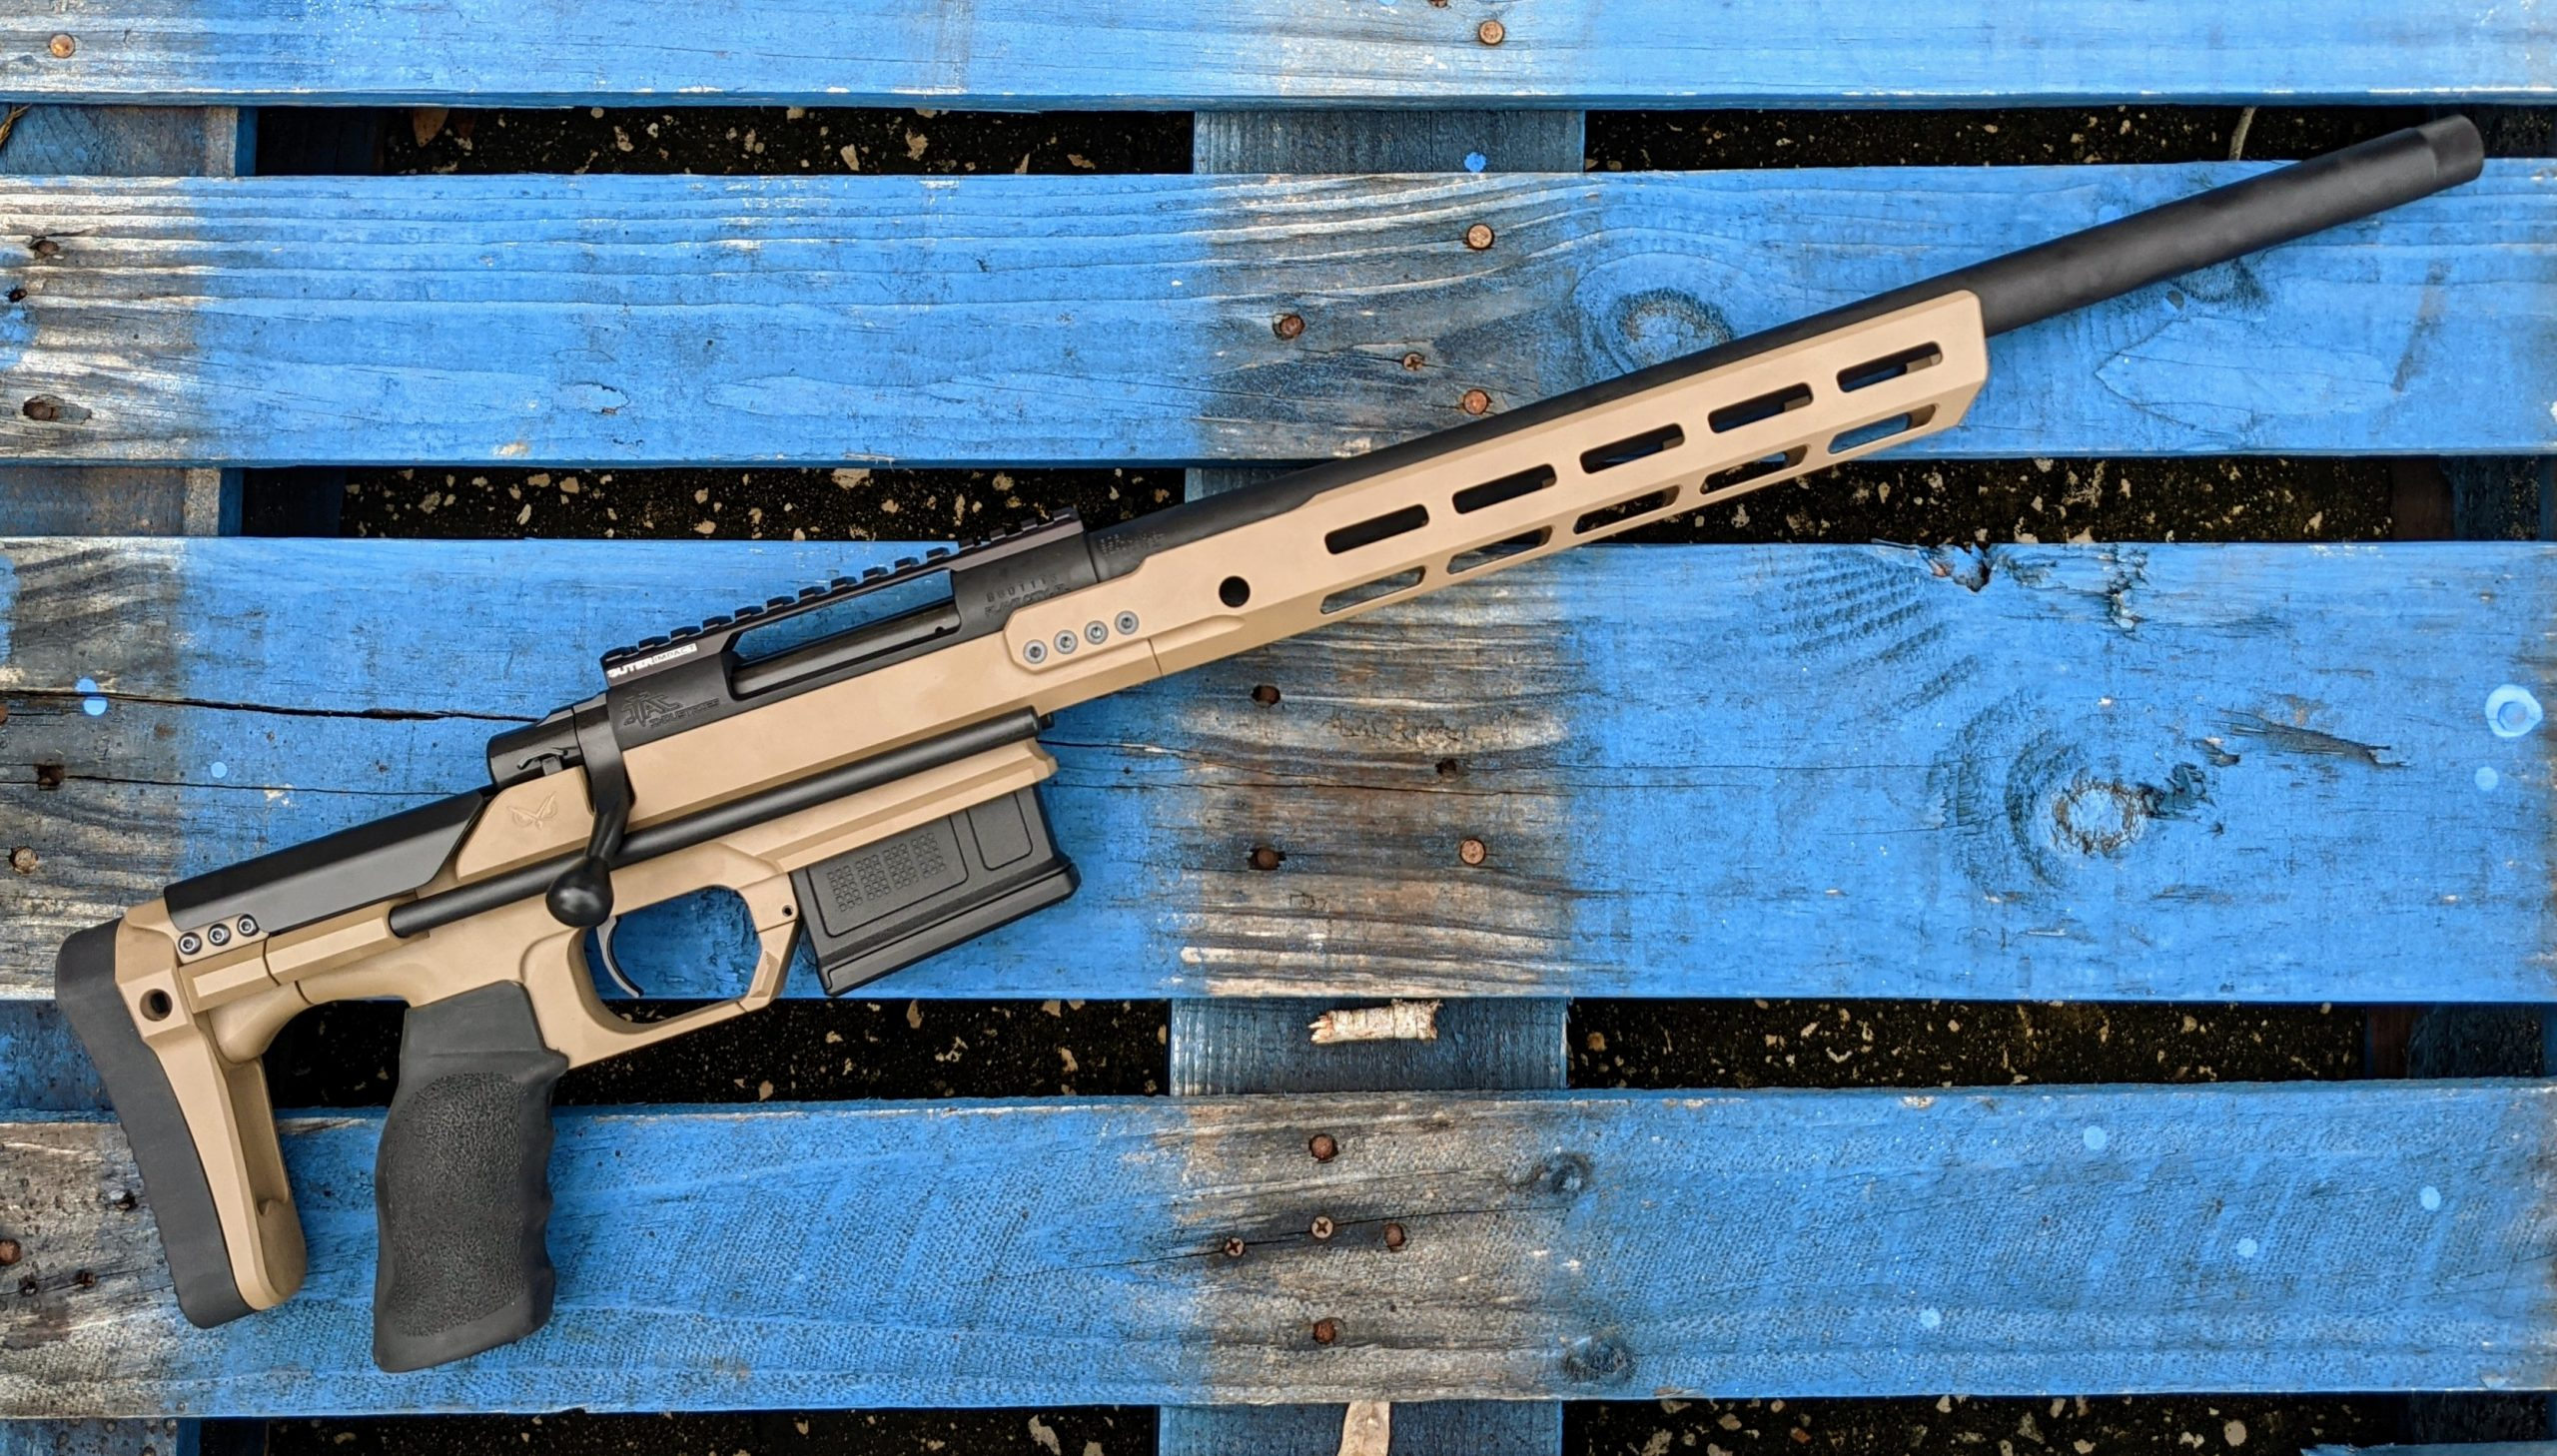 Screech Owl 1500 Rifle